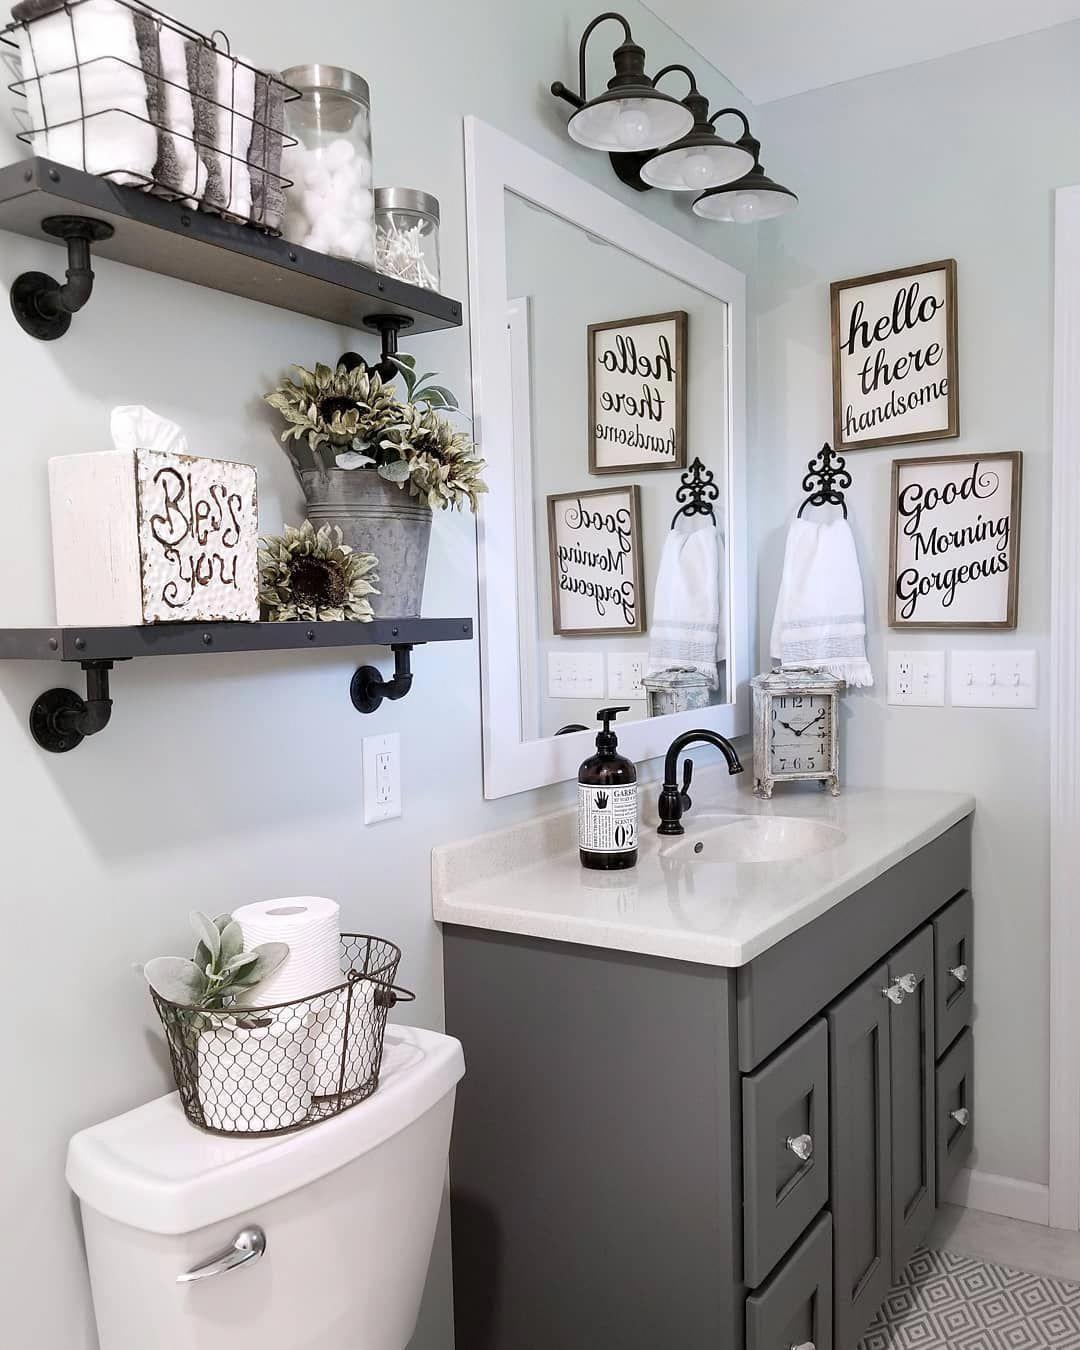 15 Adorable Bathroom Lighting Ideas Inspired By Professionals Smallbathroomdec In 2020 Chic Bathroom Decor Farmhouse Bathroom Organizers Shabby Chic Bathroom Decor